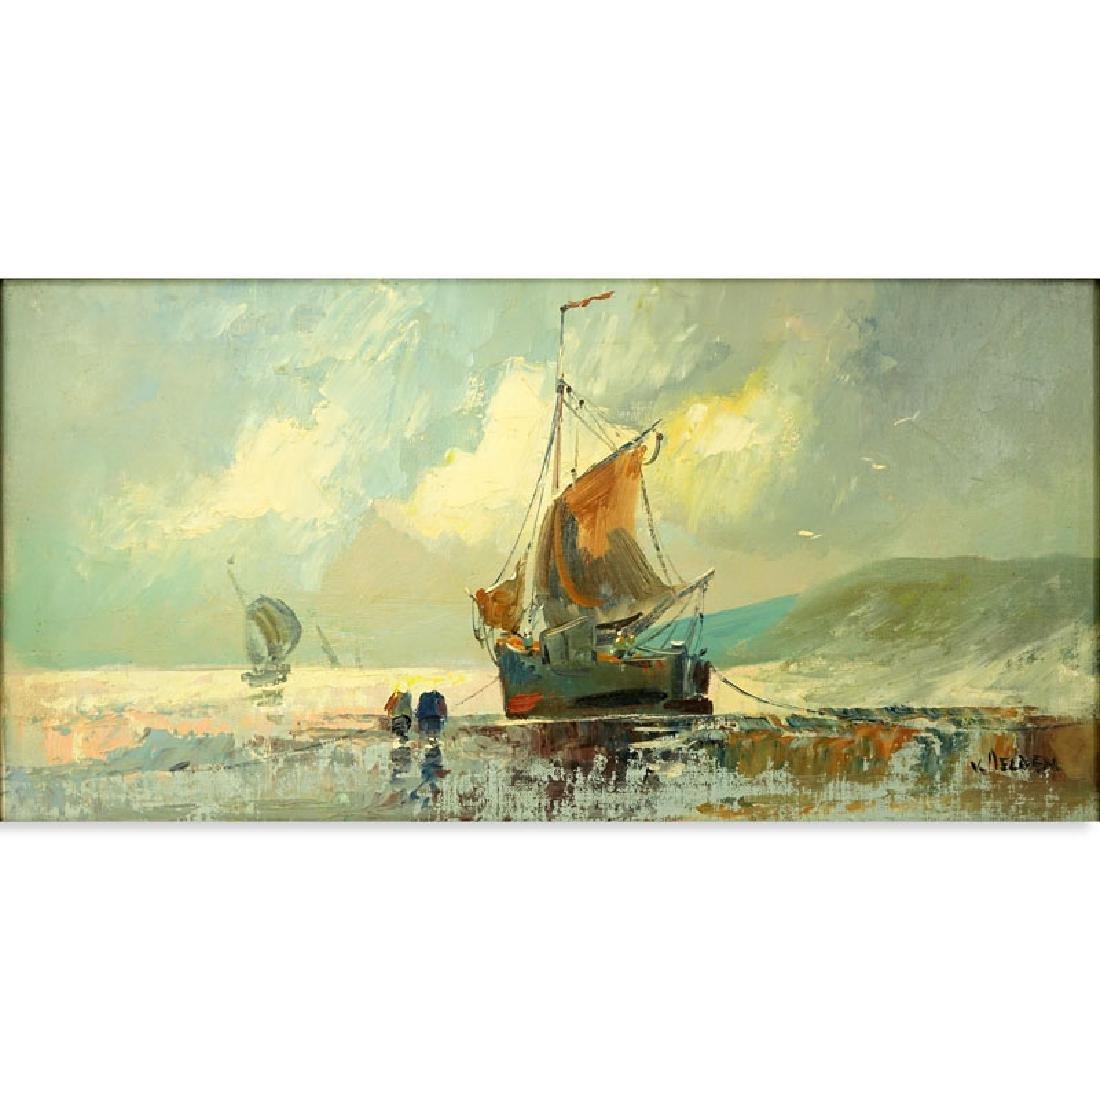 Jan Van Delden, Dutch (early 20th century) Oil on